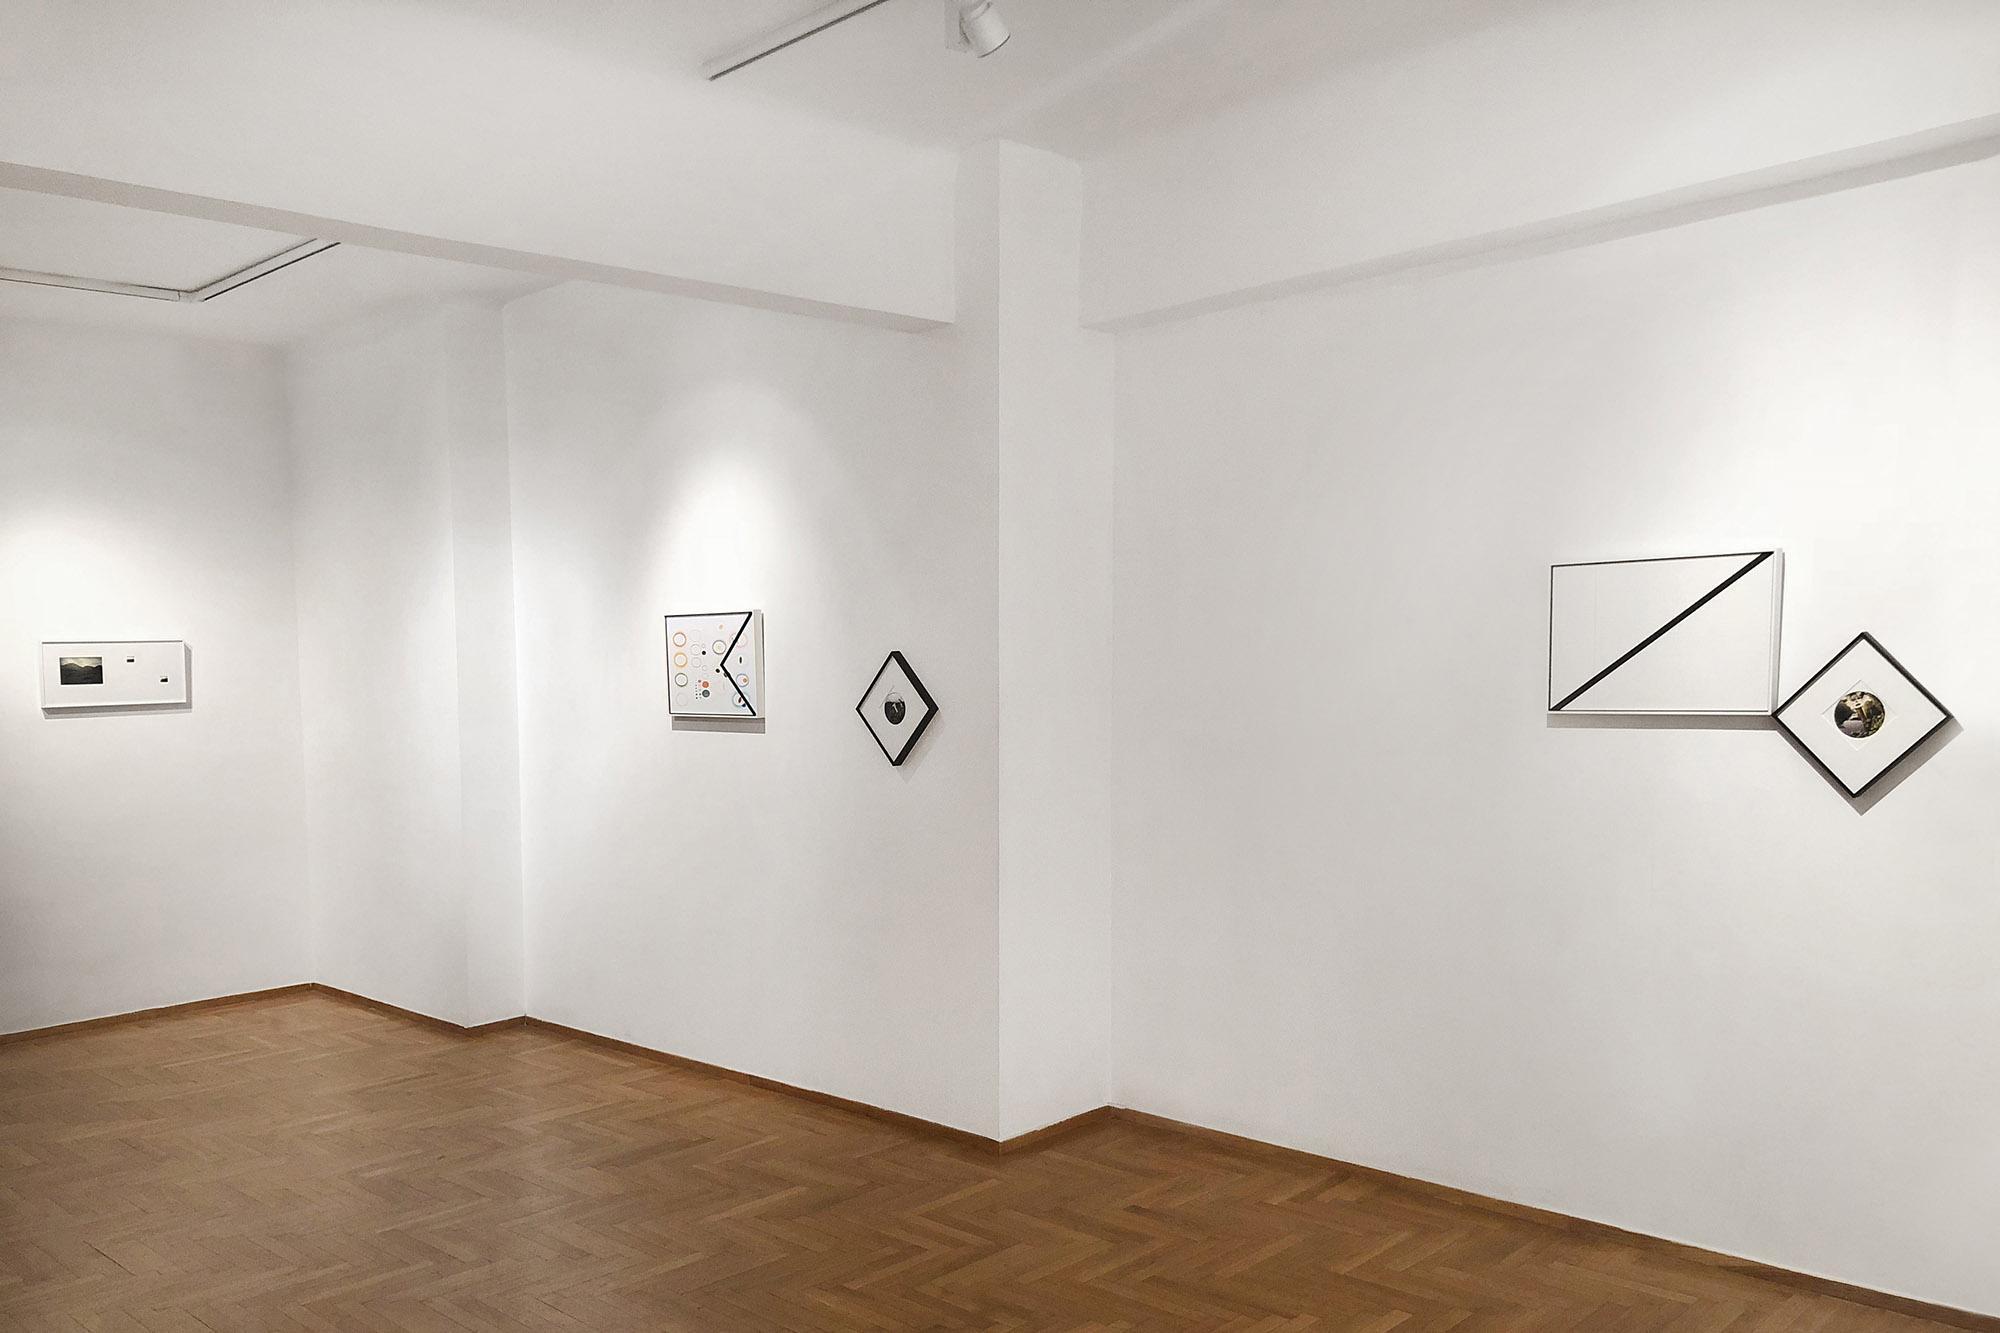 Apostolos Karastergiou / Five Spots Six - Image 1